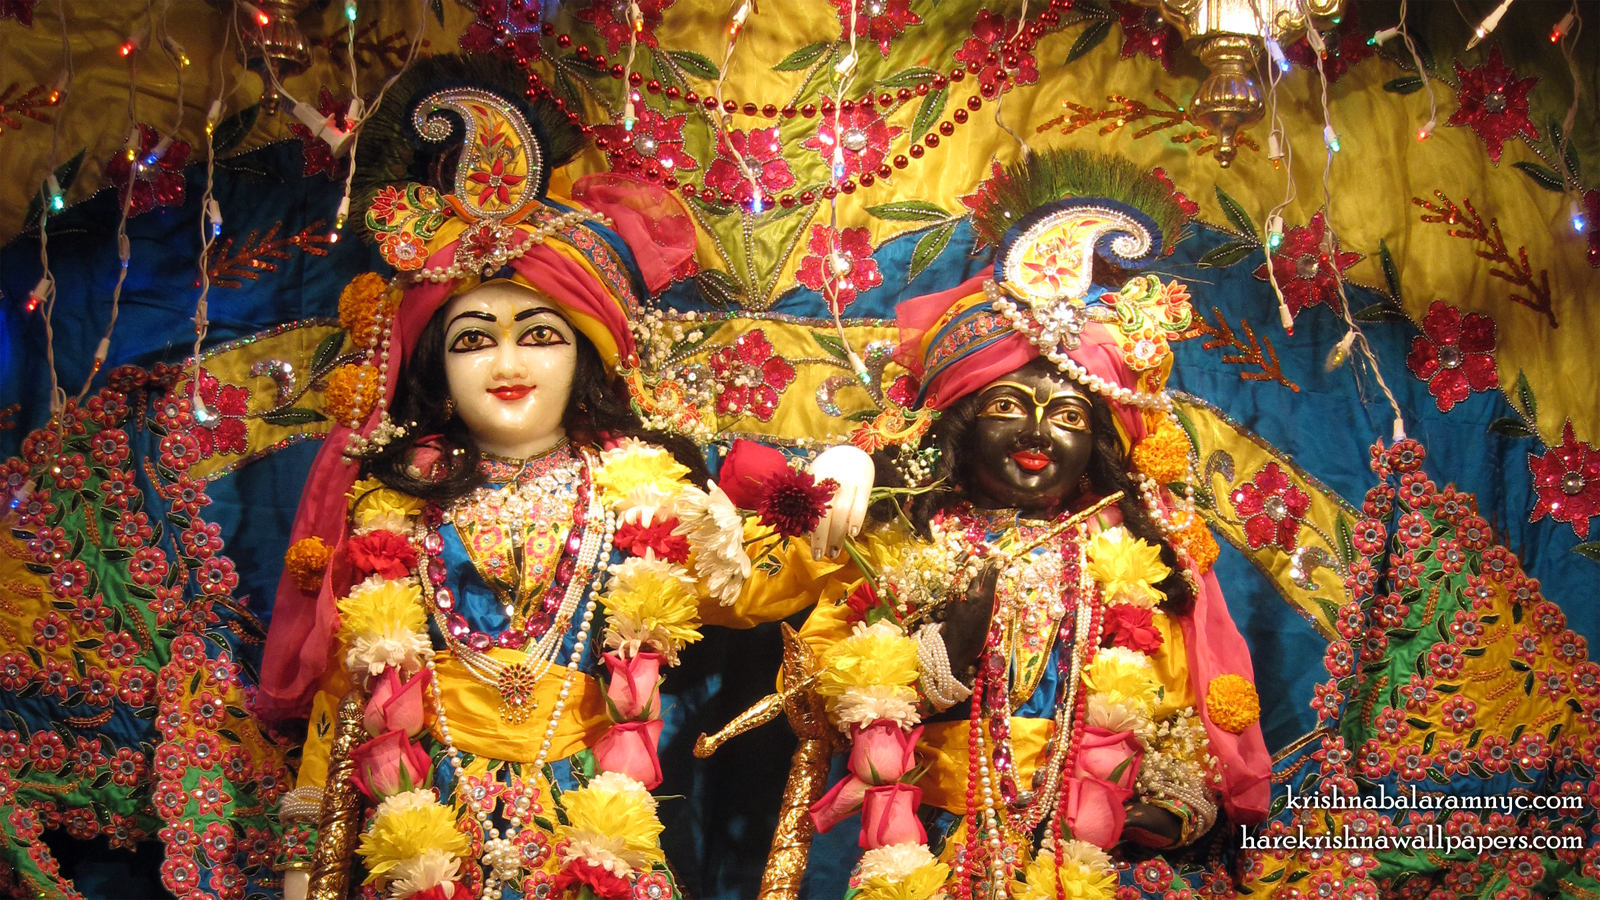 Sri Sri Hari Haladhari Close up Wallpaper (002) Size 1600x900 Download